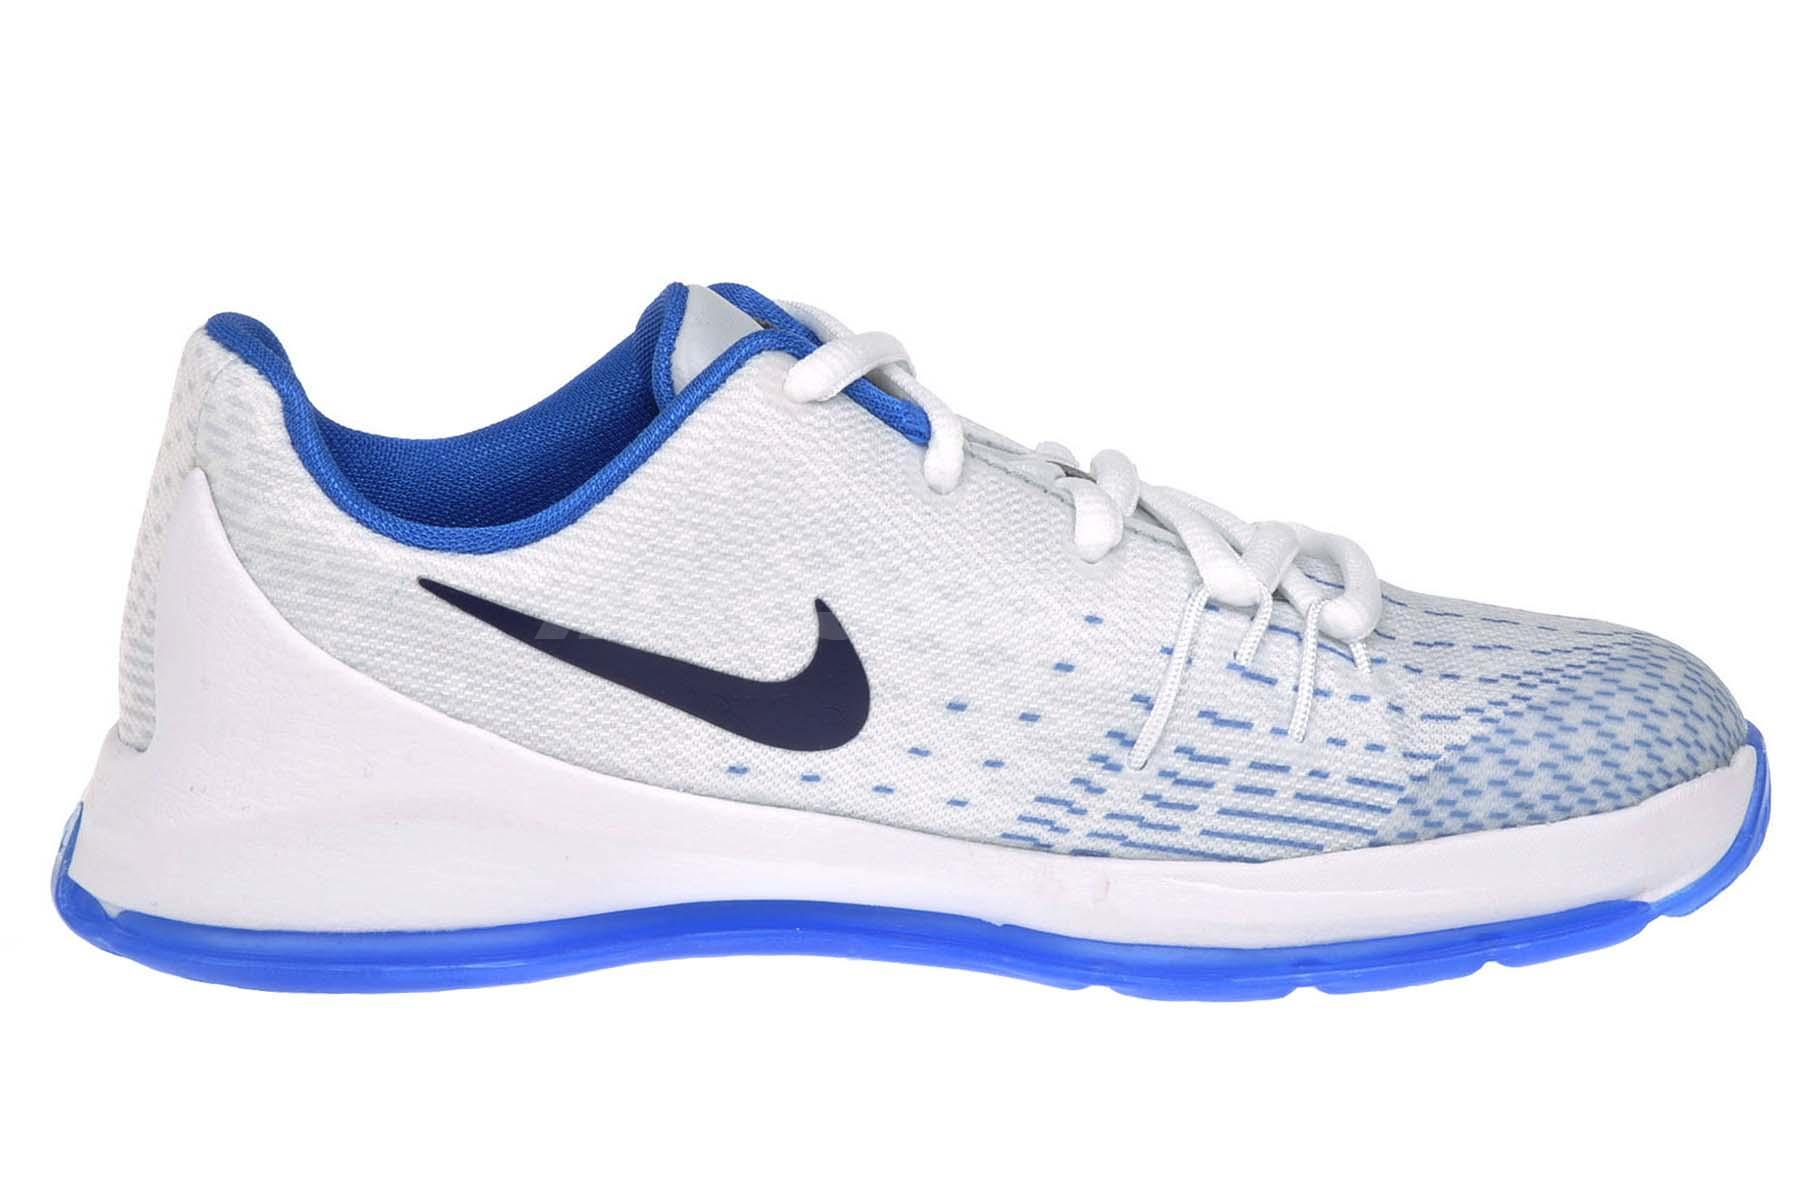 nike kd 8 ps basketball shoes preschool boys girls kids